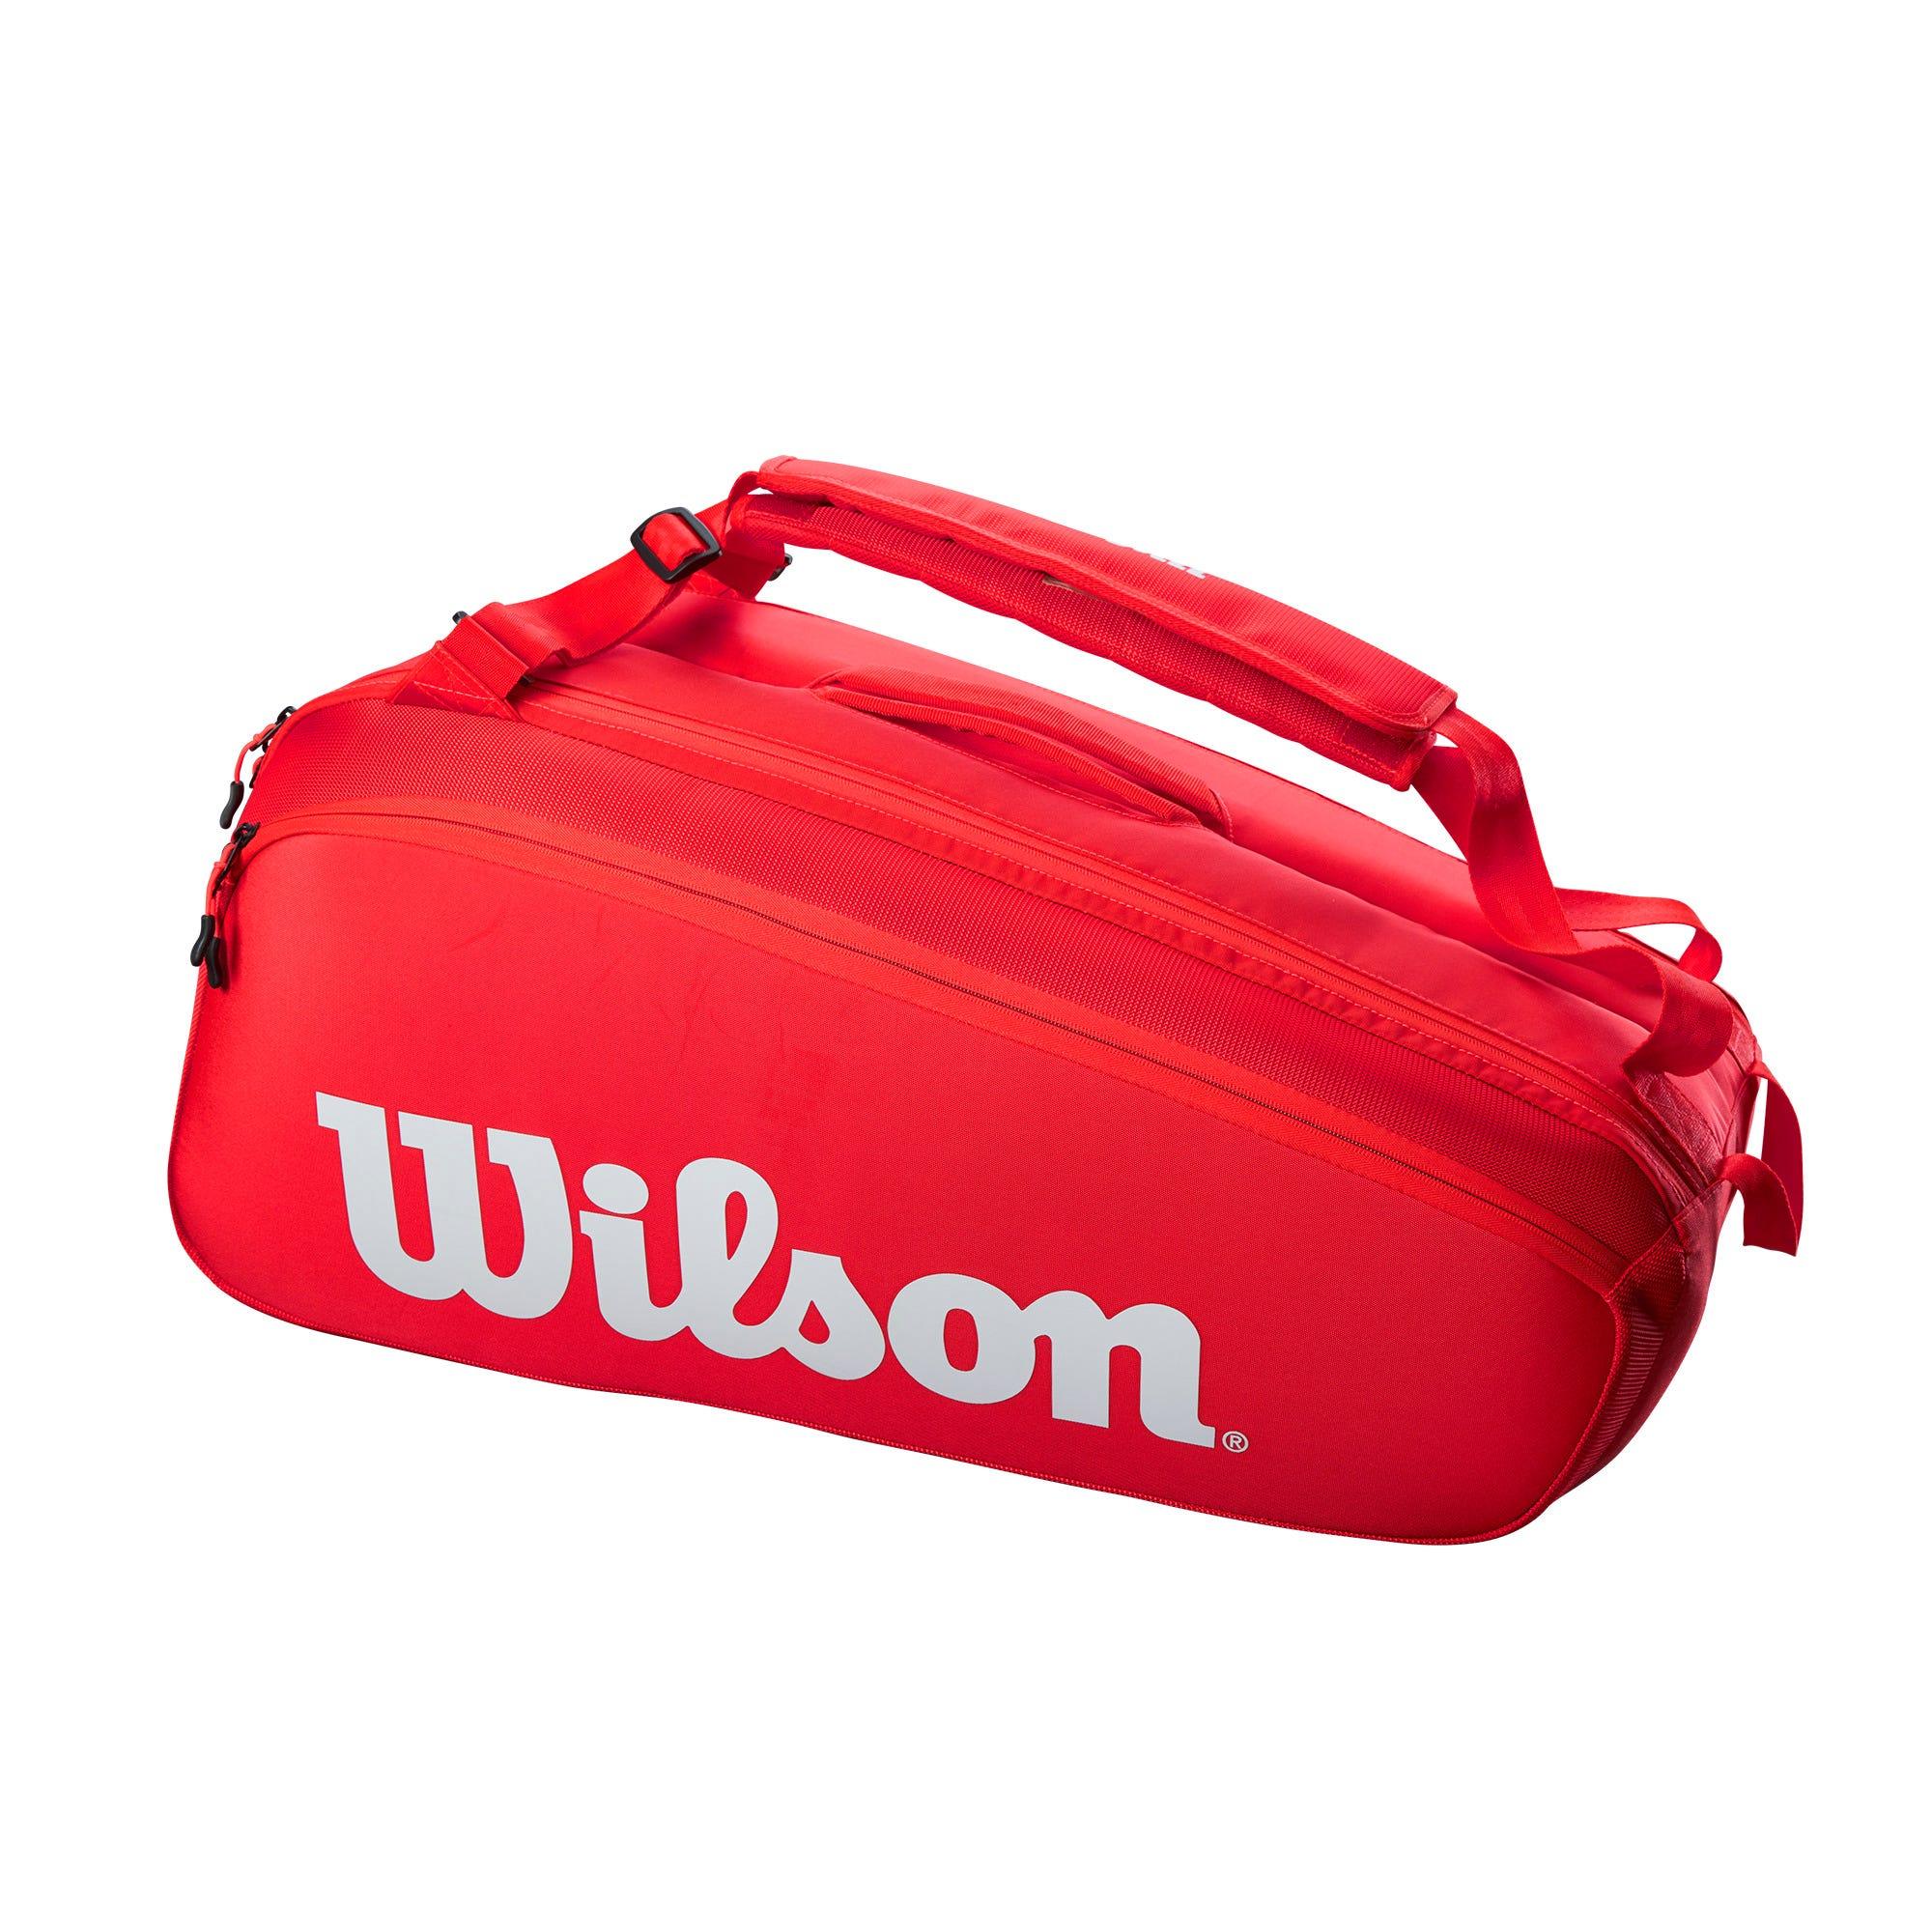 Super Tour 9 pack tennis bag